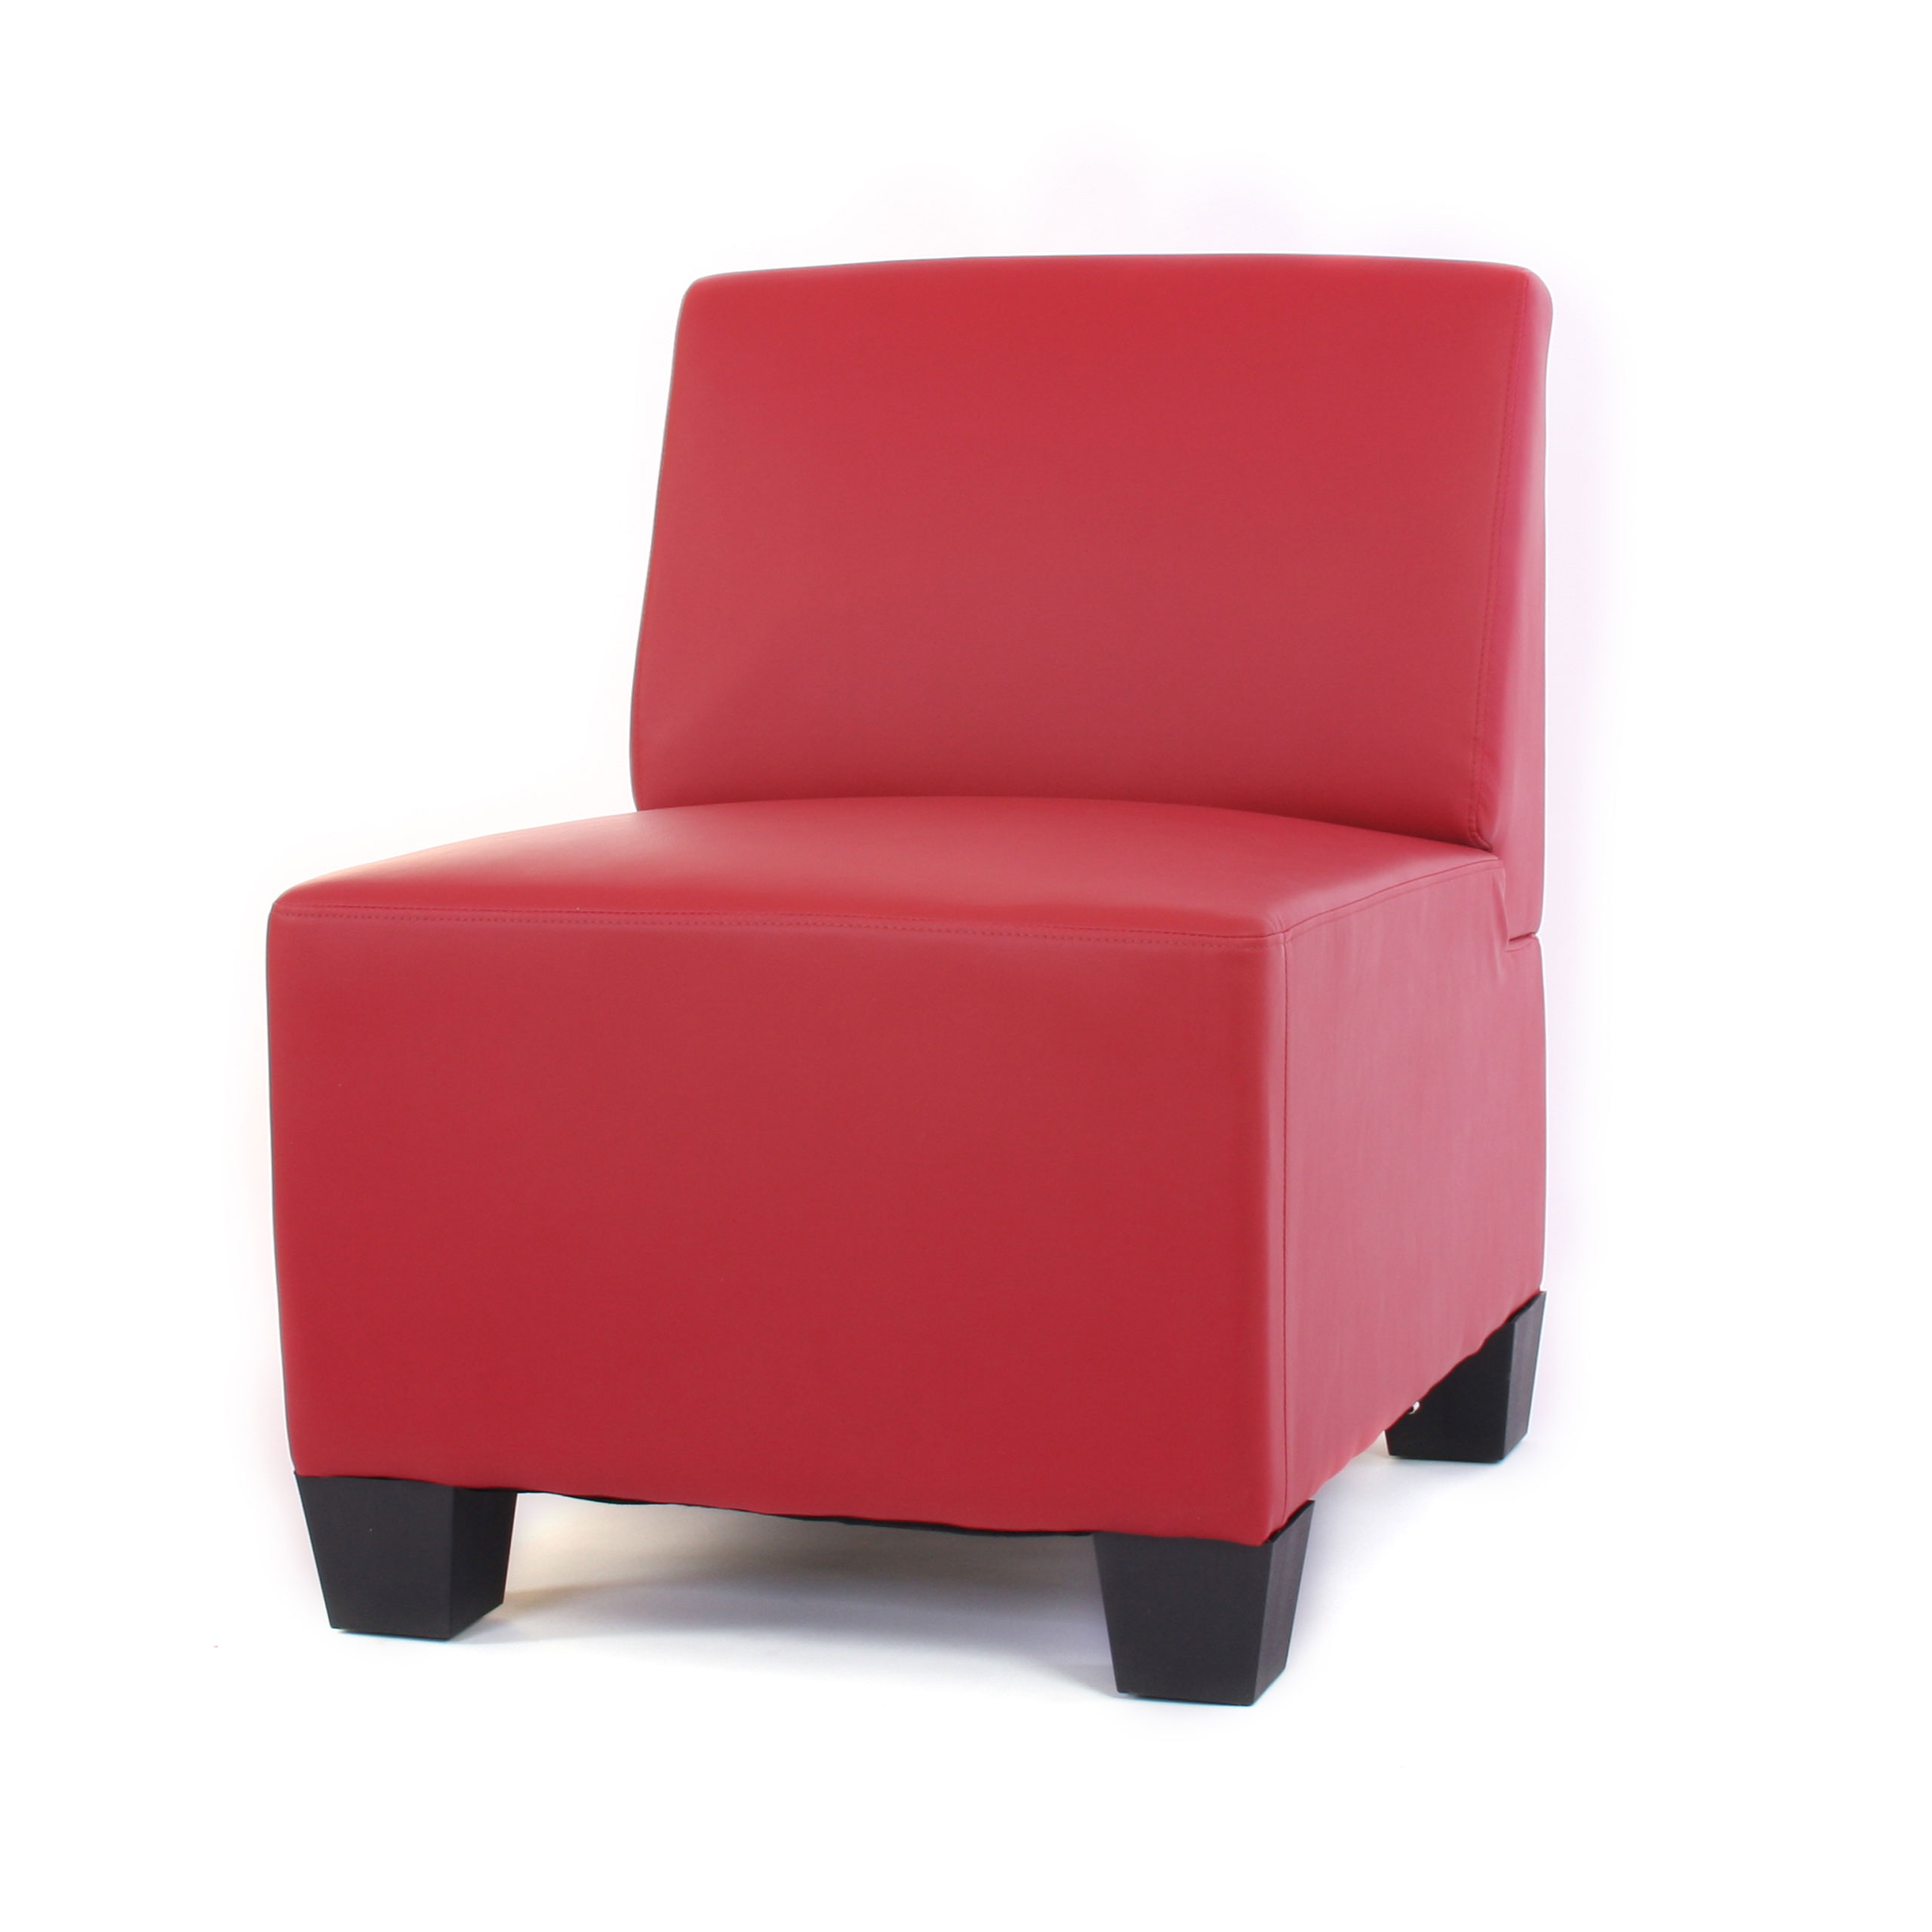 modular 4 sitzer sofa couch lyon kunstleder rot hohe armlehnen. Black Bedroom Furniture Sets. Home Design Ideas